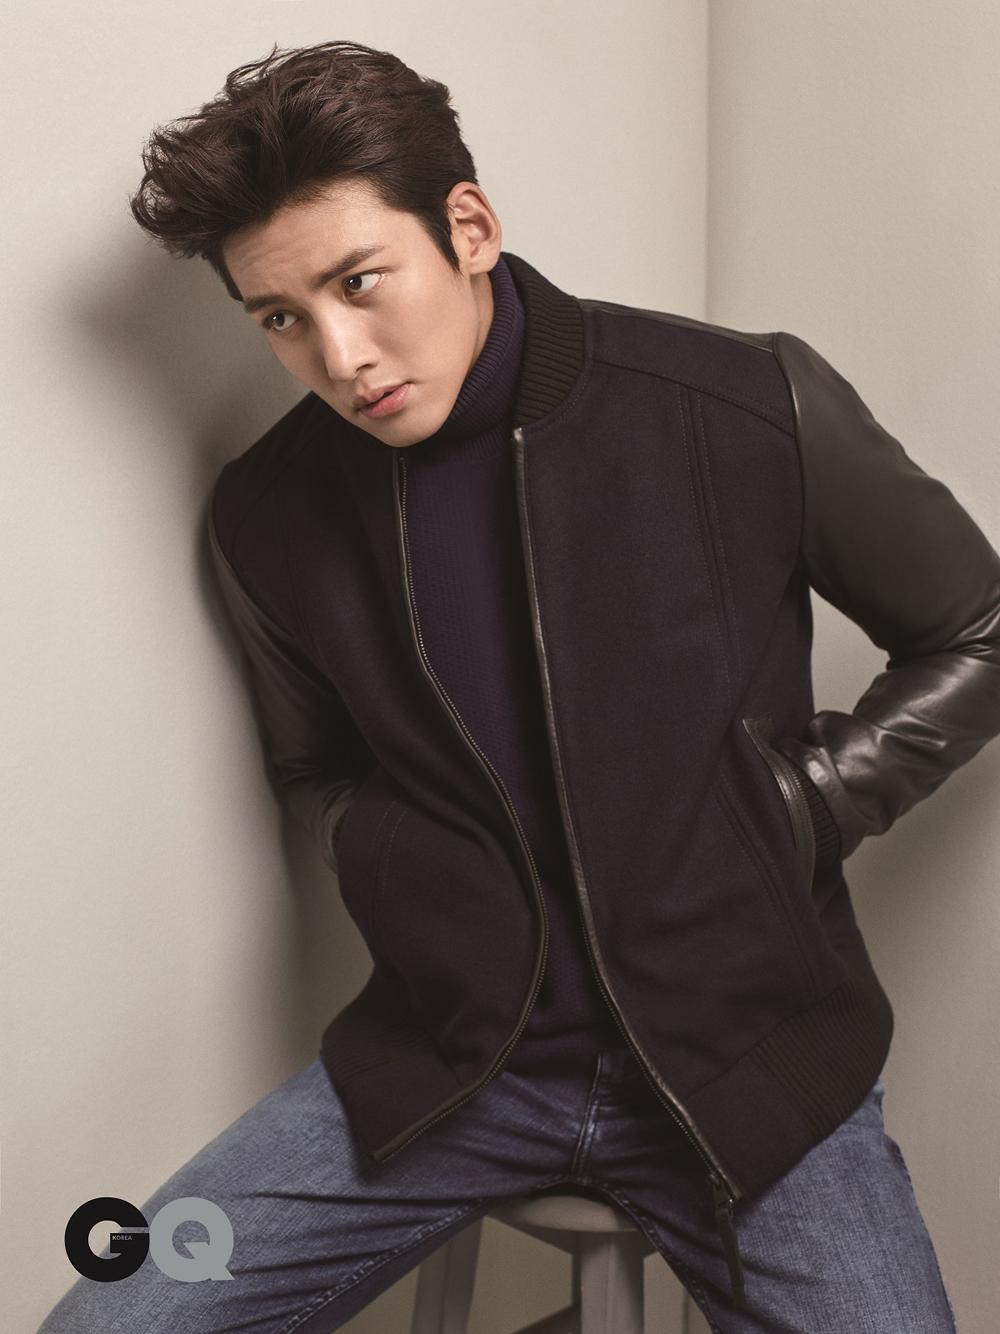 Ji Chang Wook Looks Dandy in Denim for GQ Magazine - POPdramatic